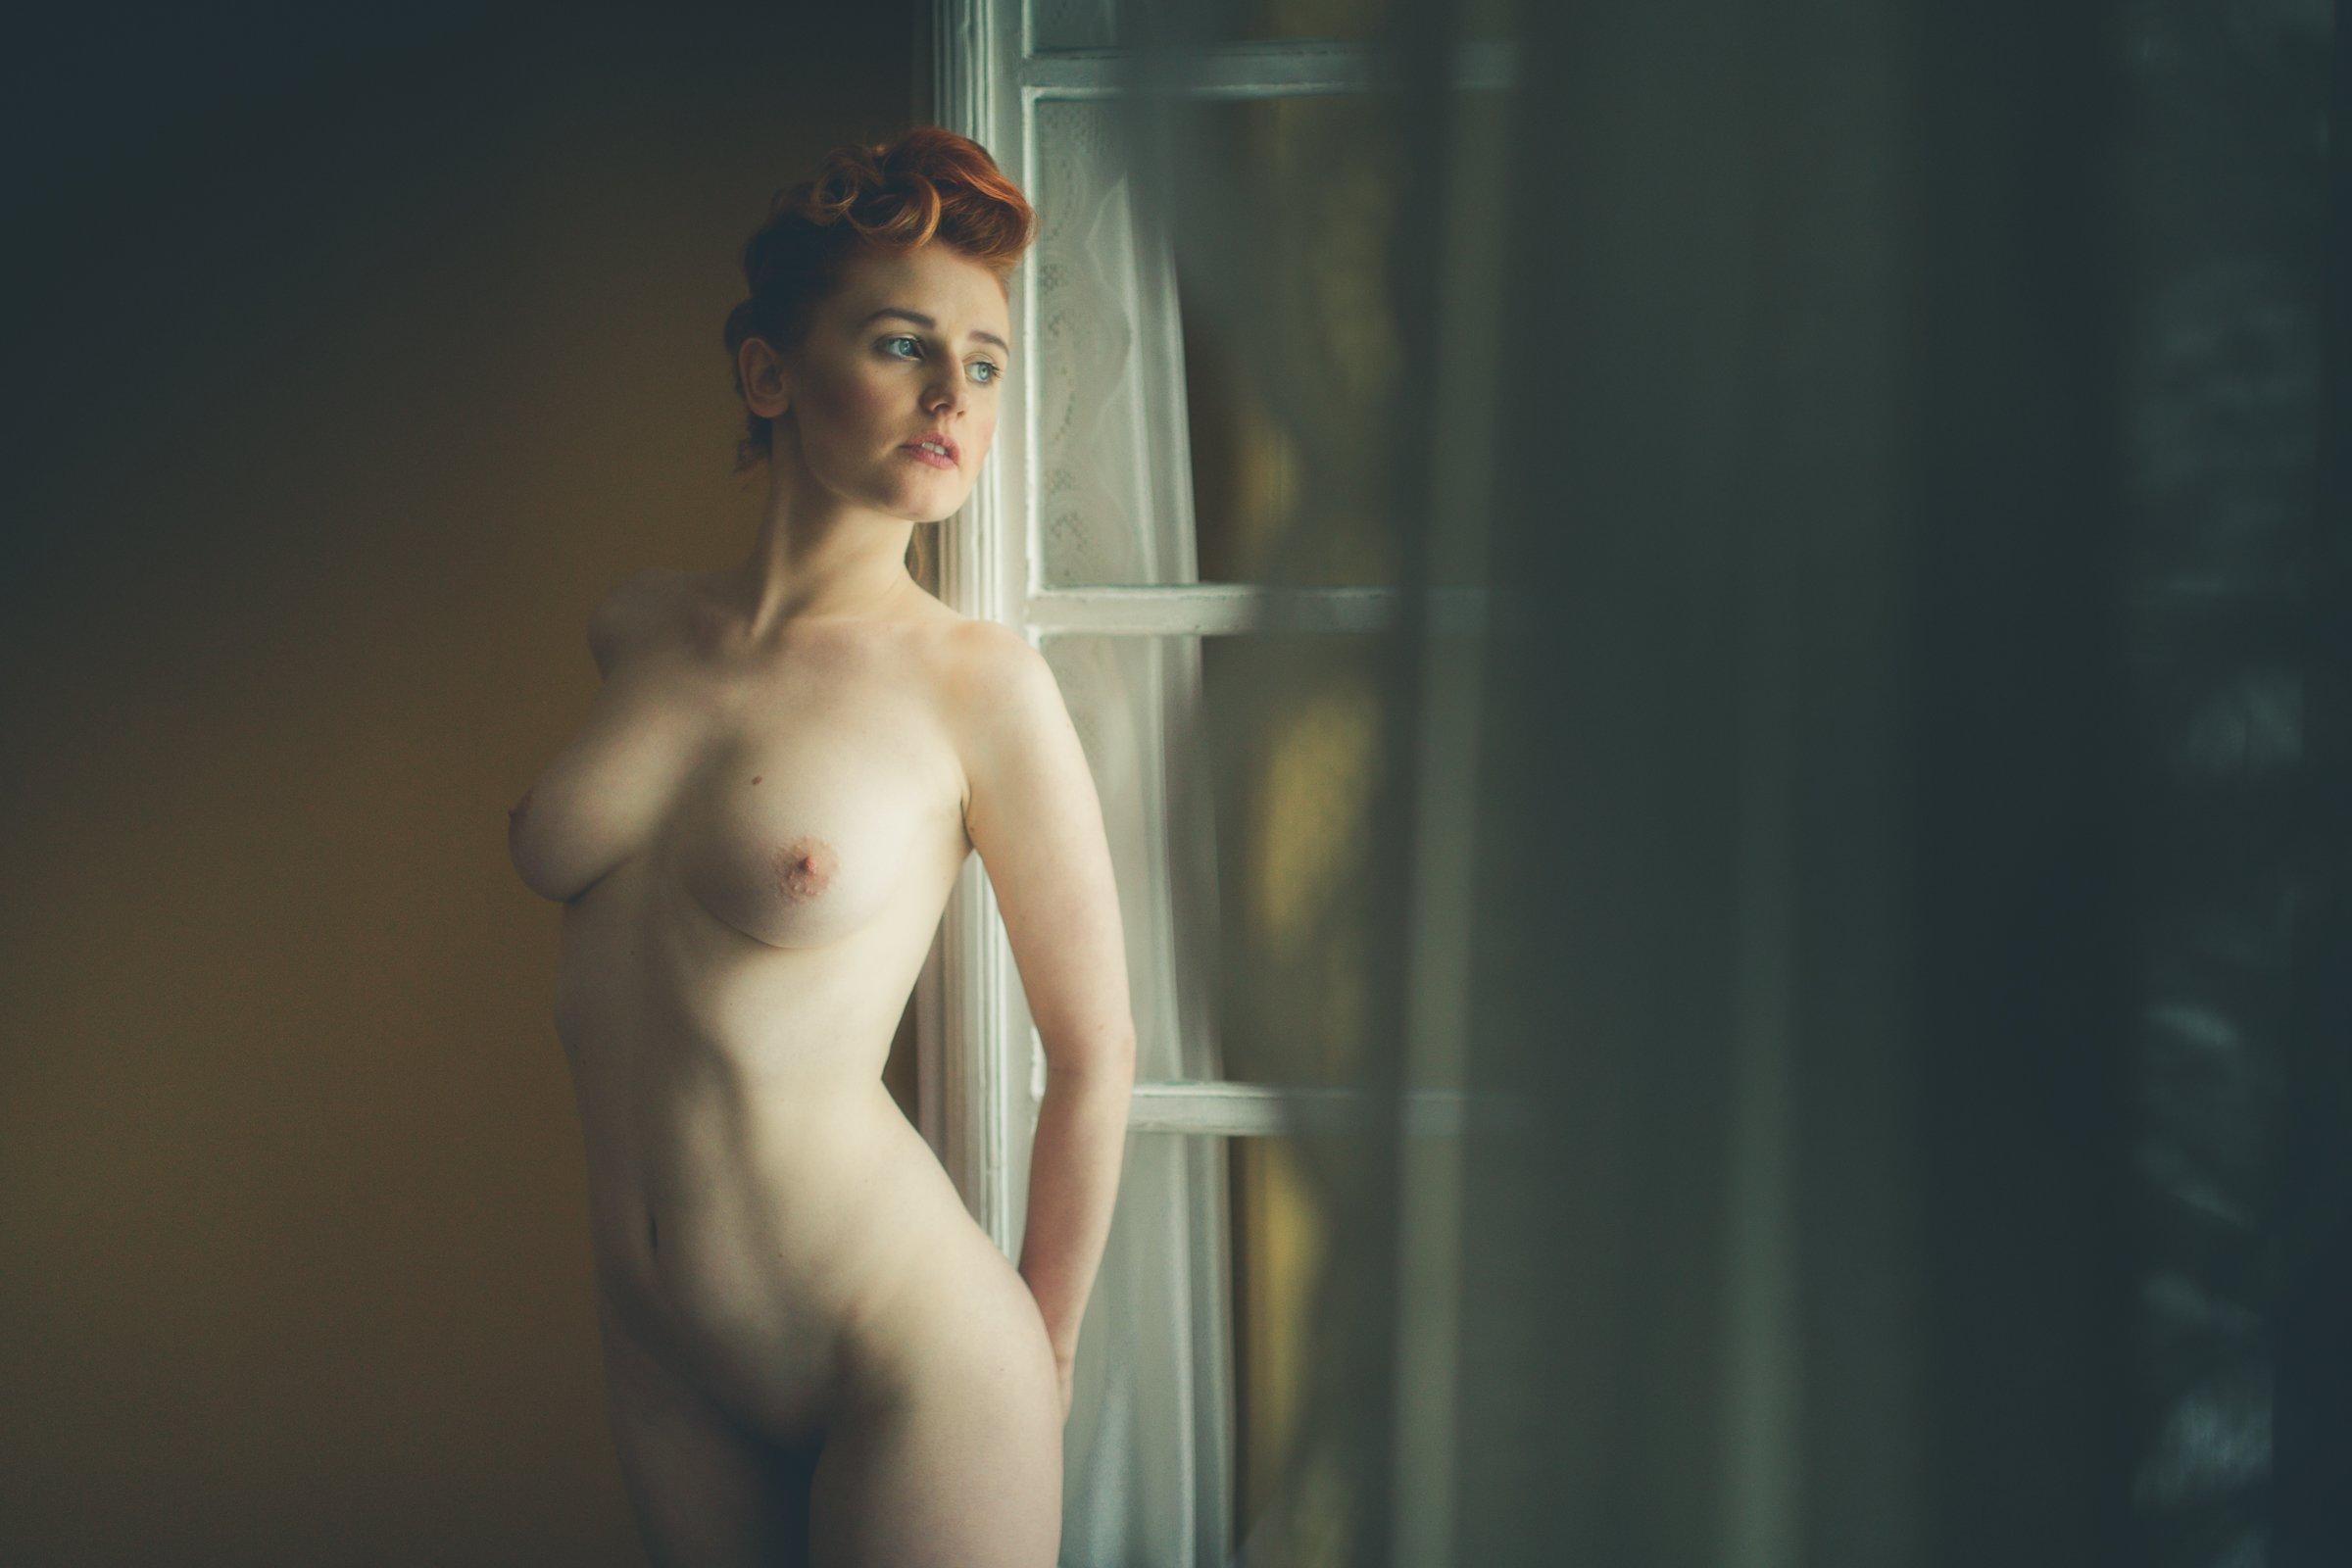 nude,girl,window,light, Marek Biegalski